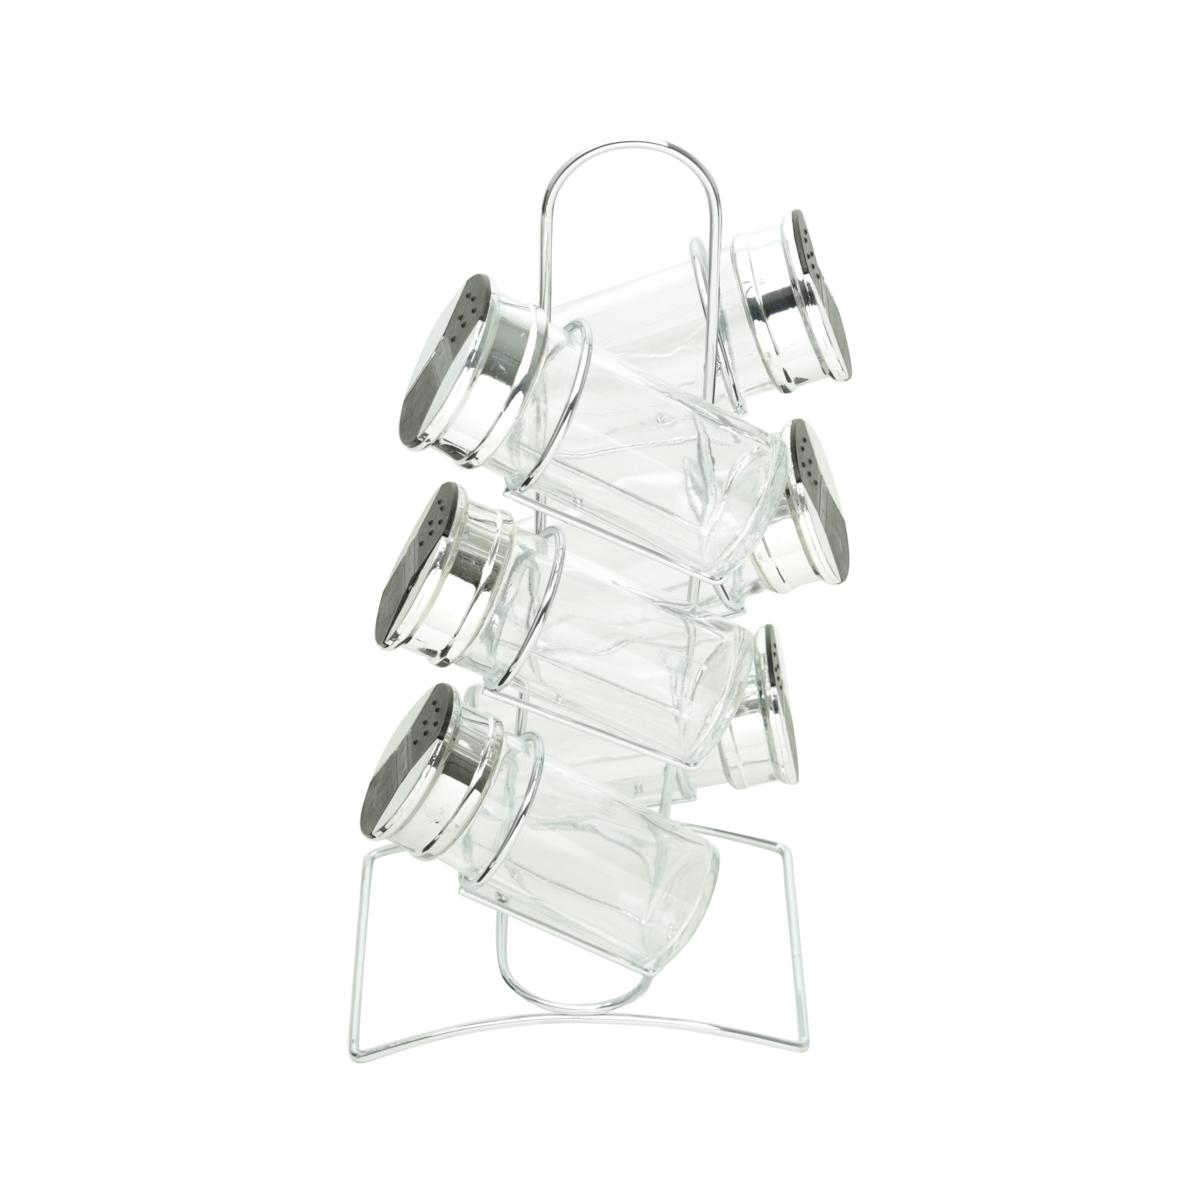 Cj 6 porta temperos vidro suporte metal 14x10x28 Bon Gourmet